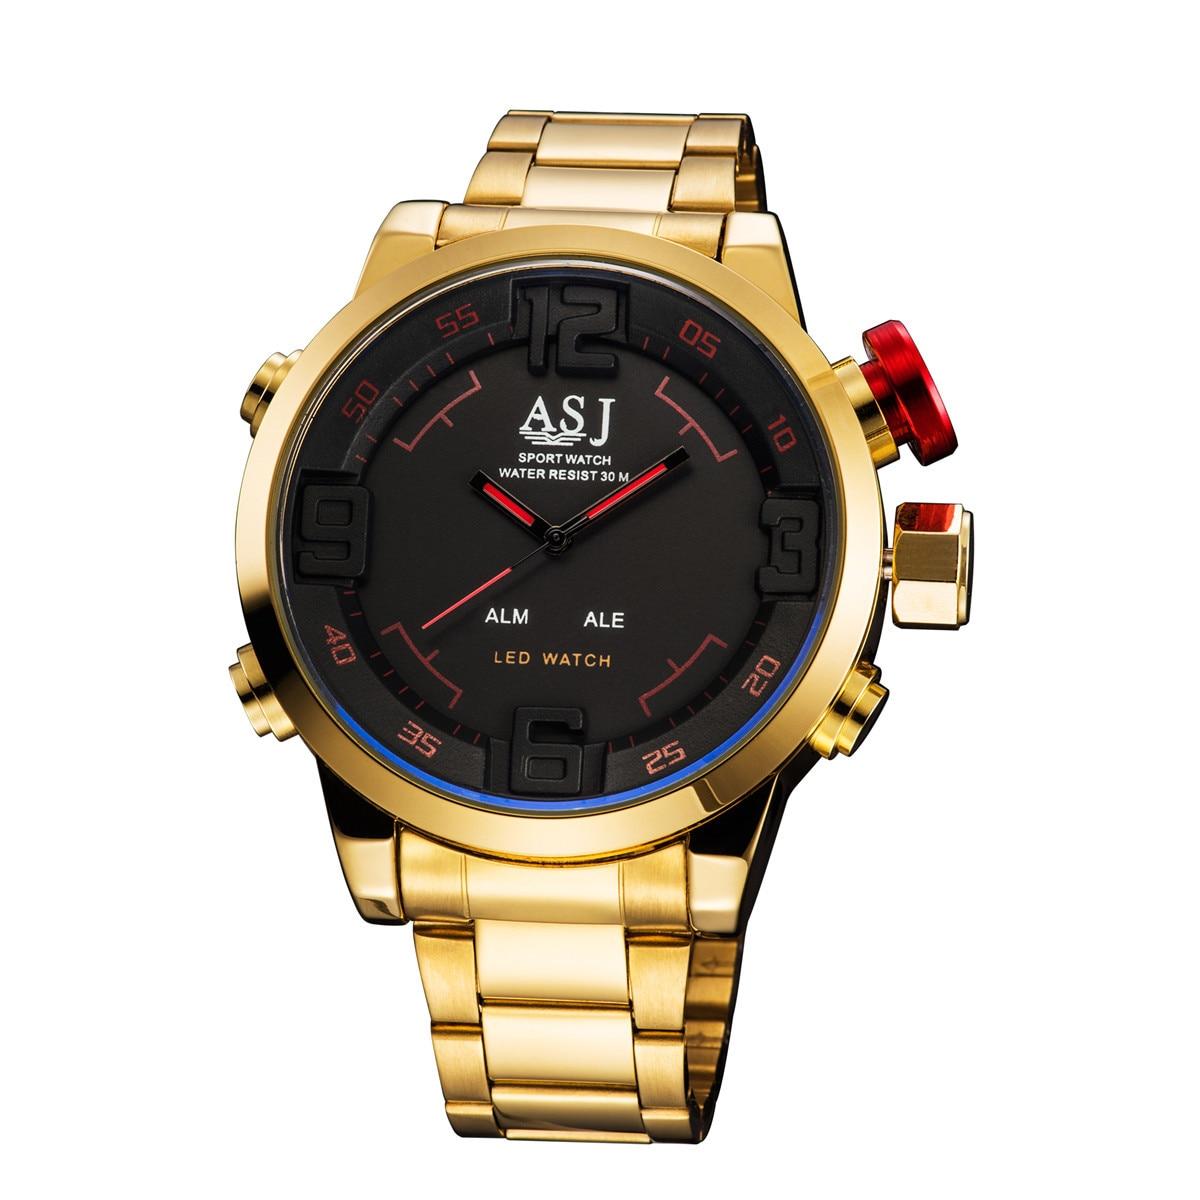 ASJ Brand Men's Military Watches Men Luxury Gold Steel Strap Quartz Watch LED Display Sports Wristwatches 50M Waterproof wristwatches luxury brand men quartz gold watch sapphire leather strap watches men 12 month guarantee bg0389